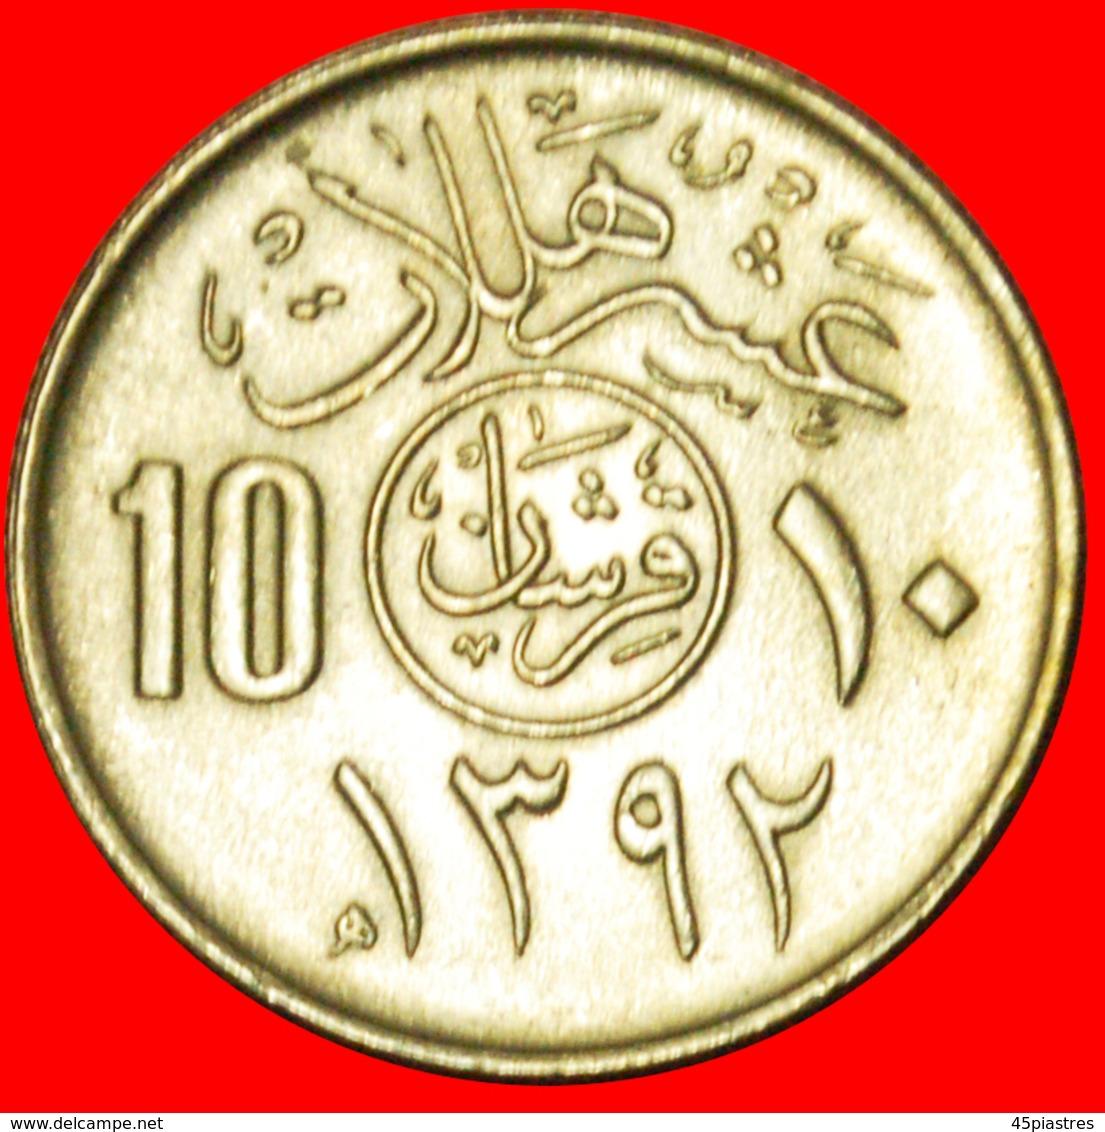 # DAGGERS AND PALMTREE: SAUDI ARABIA ★ 10 HALALA / 2 GHIRSH 1392 (1972) MINT LUSTER! LOW START ★ NO RESERVE! - Saudi Arabia